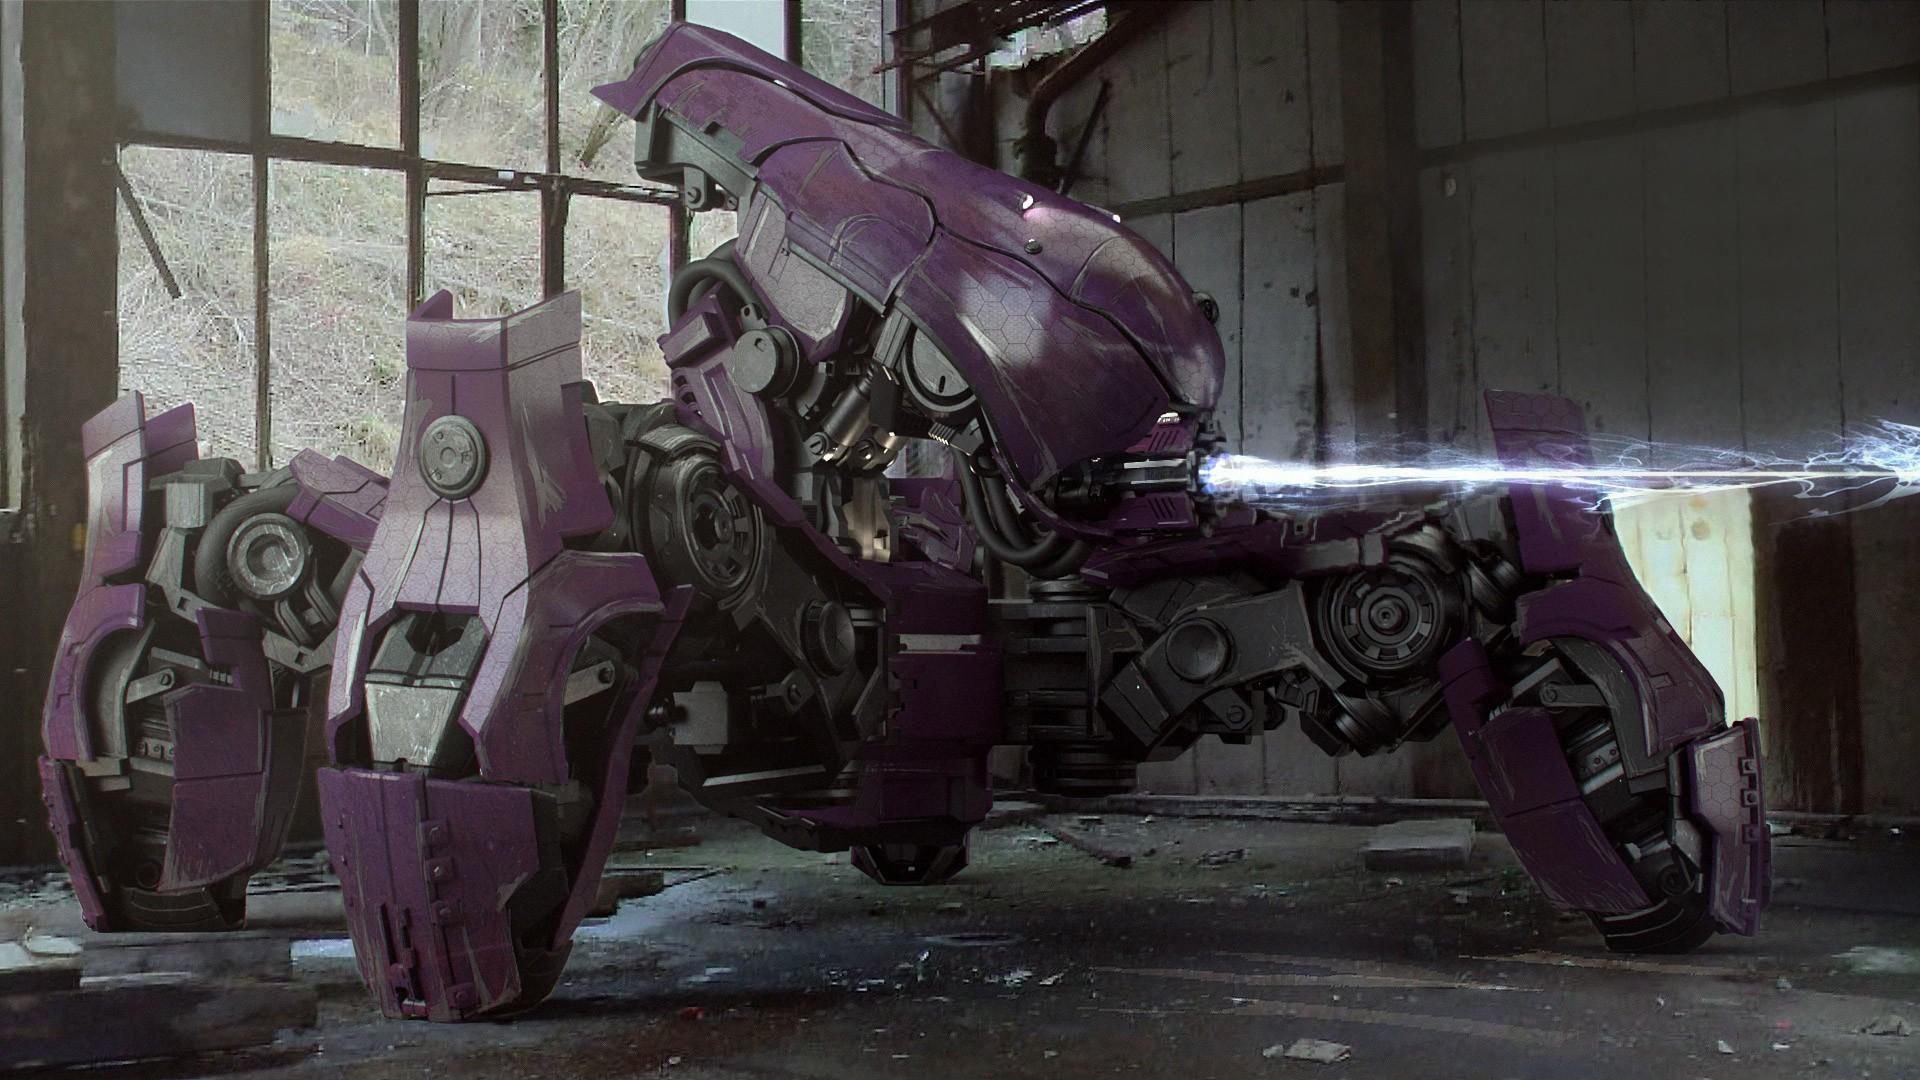 General 1920x1080 Halo video games digital art artwork robot video game art futuristic render 3D CGI machine